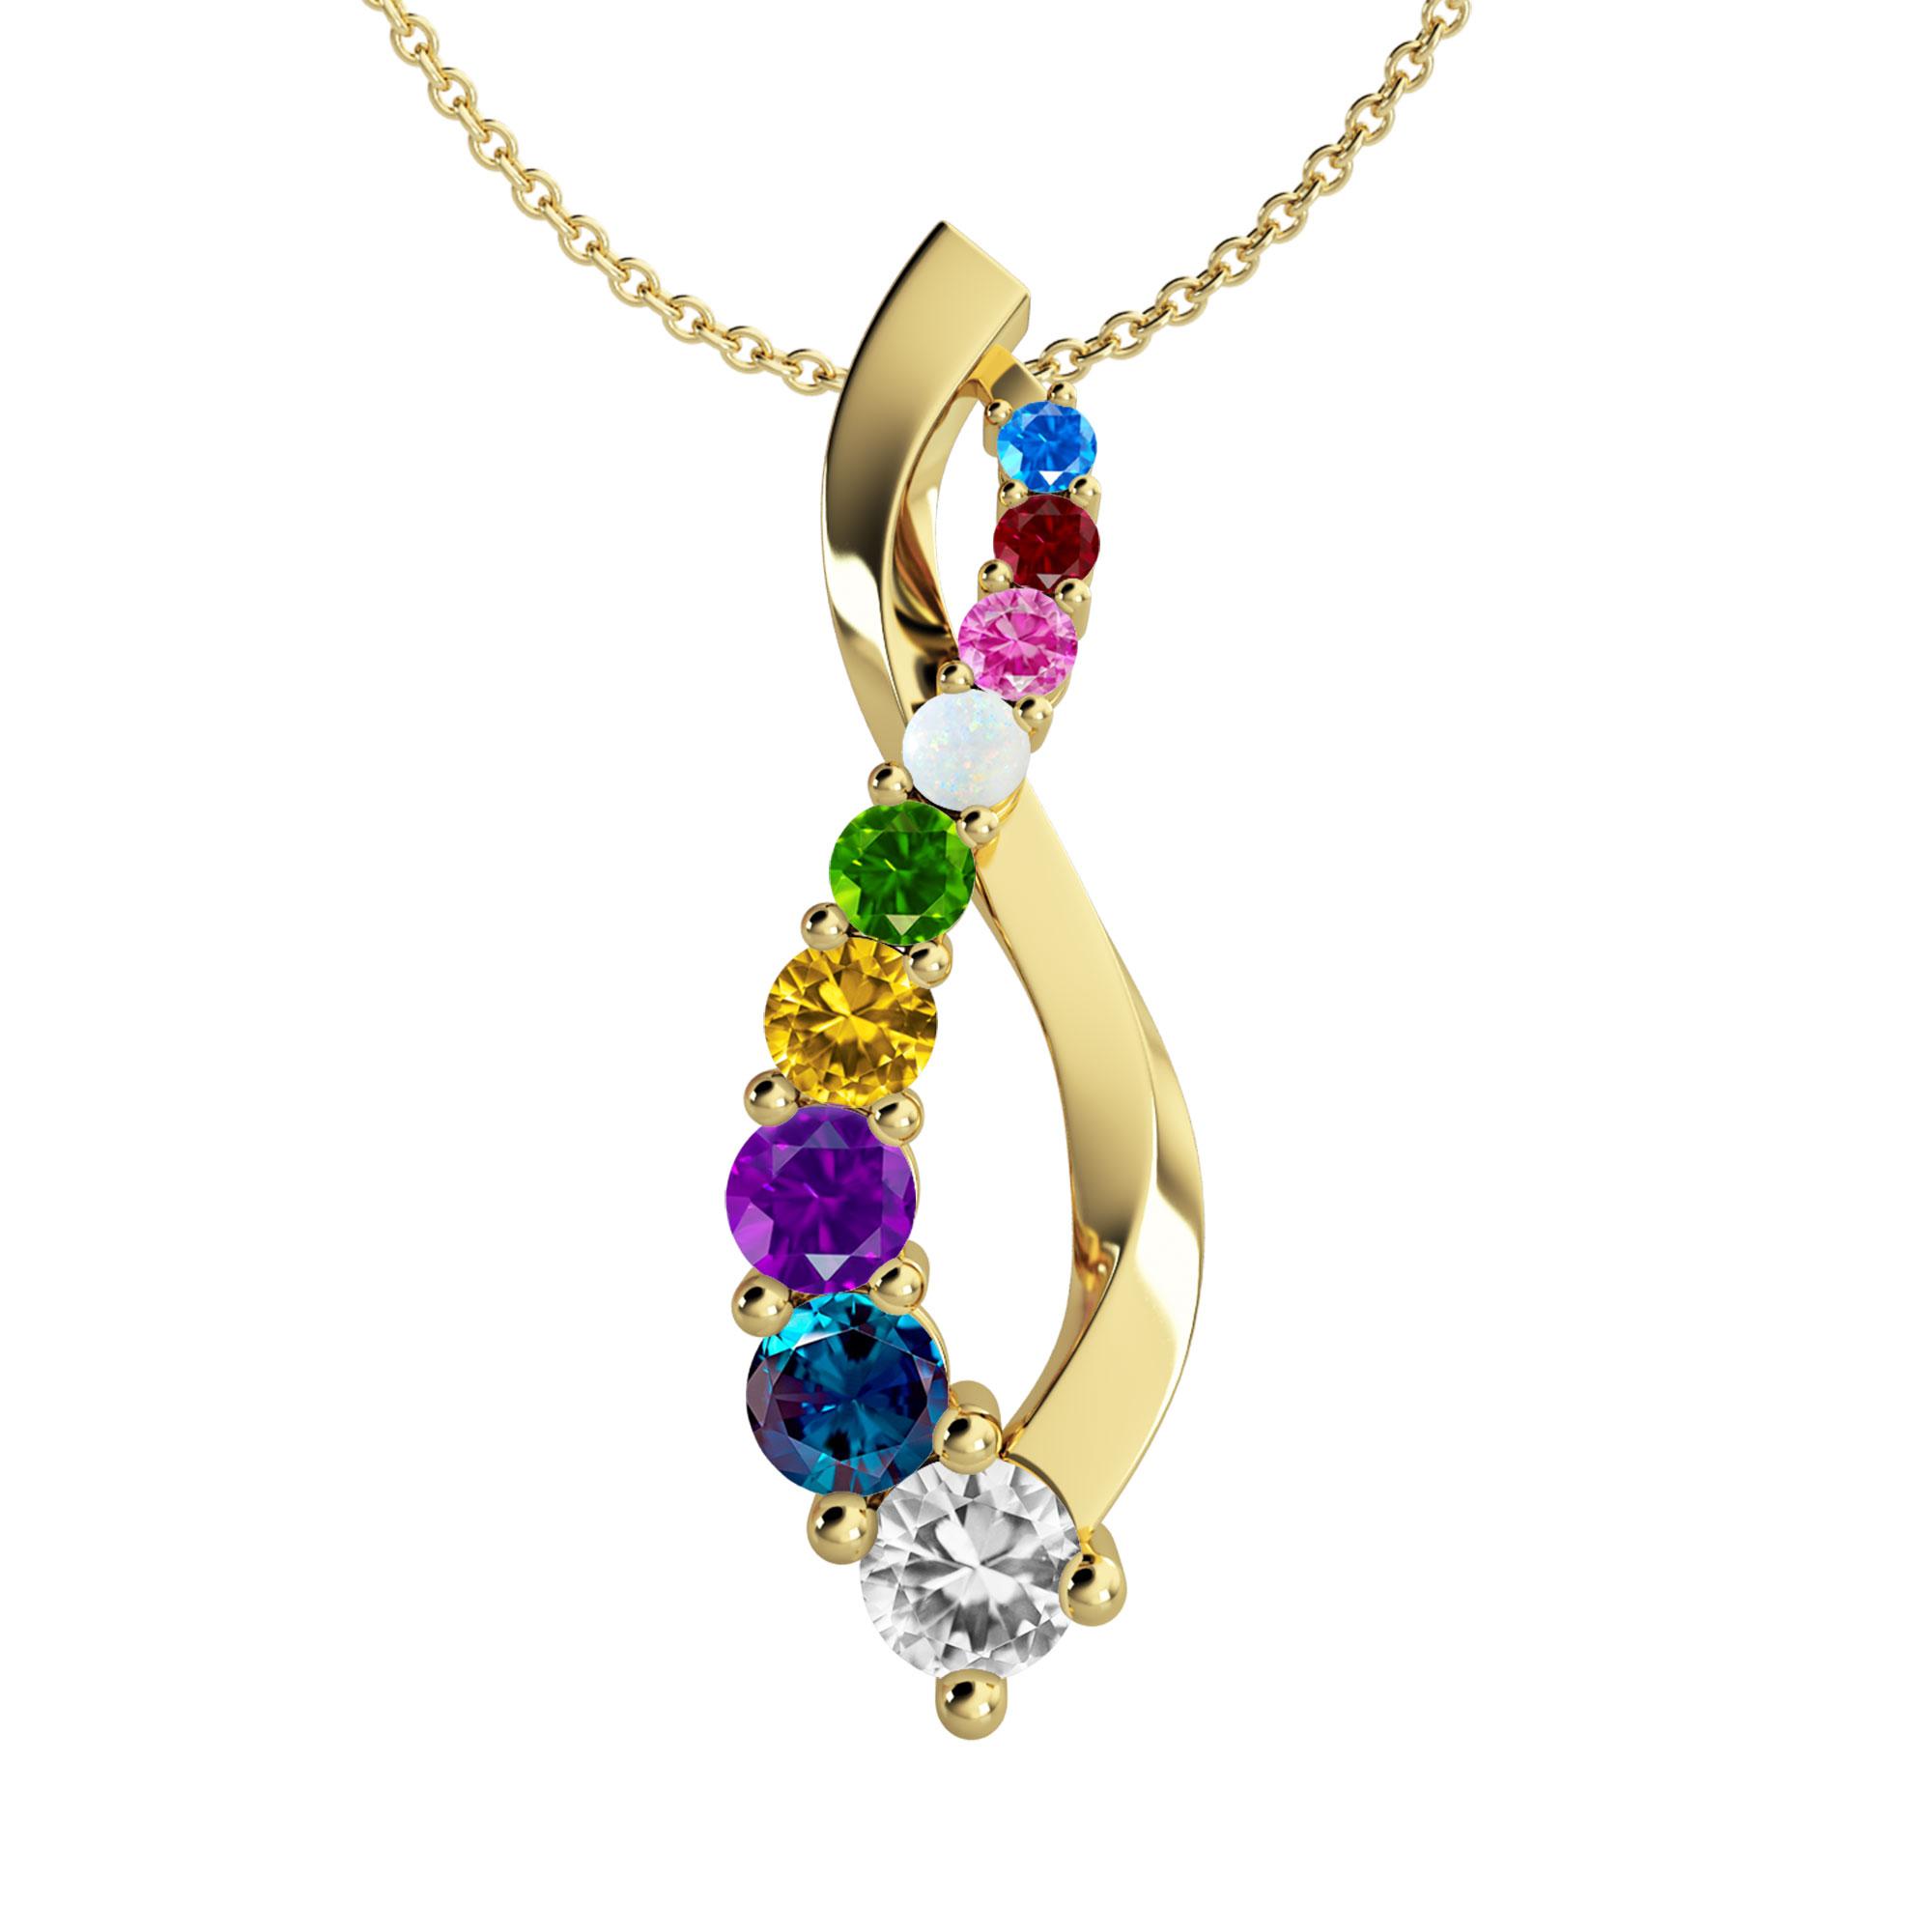 Mother's Custom Birthstone Journey Family Pendant Necklace (9 Gemstones)